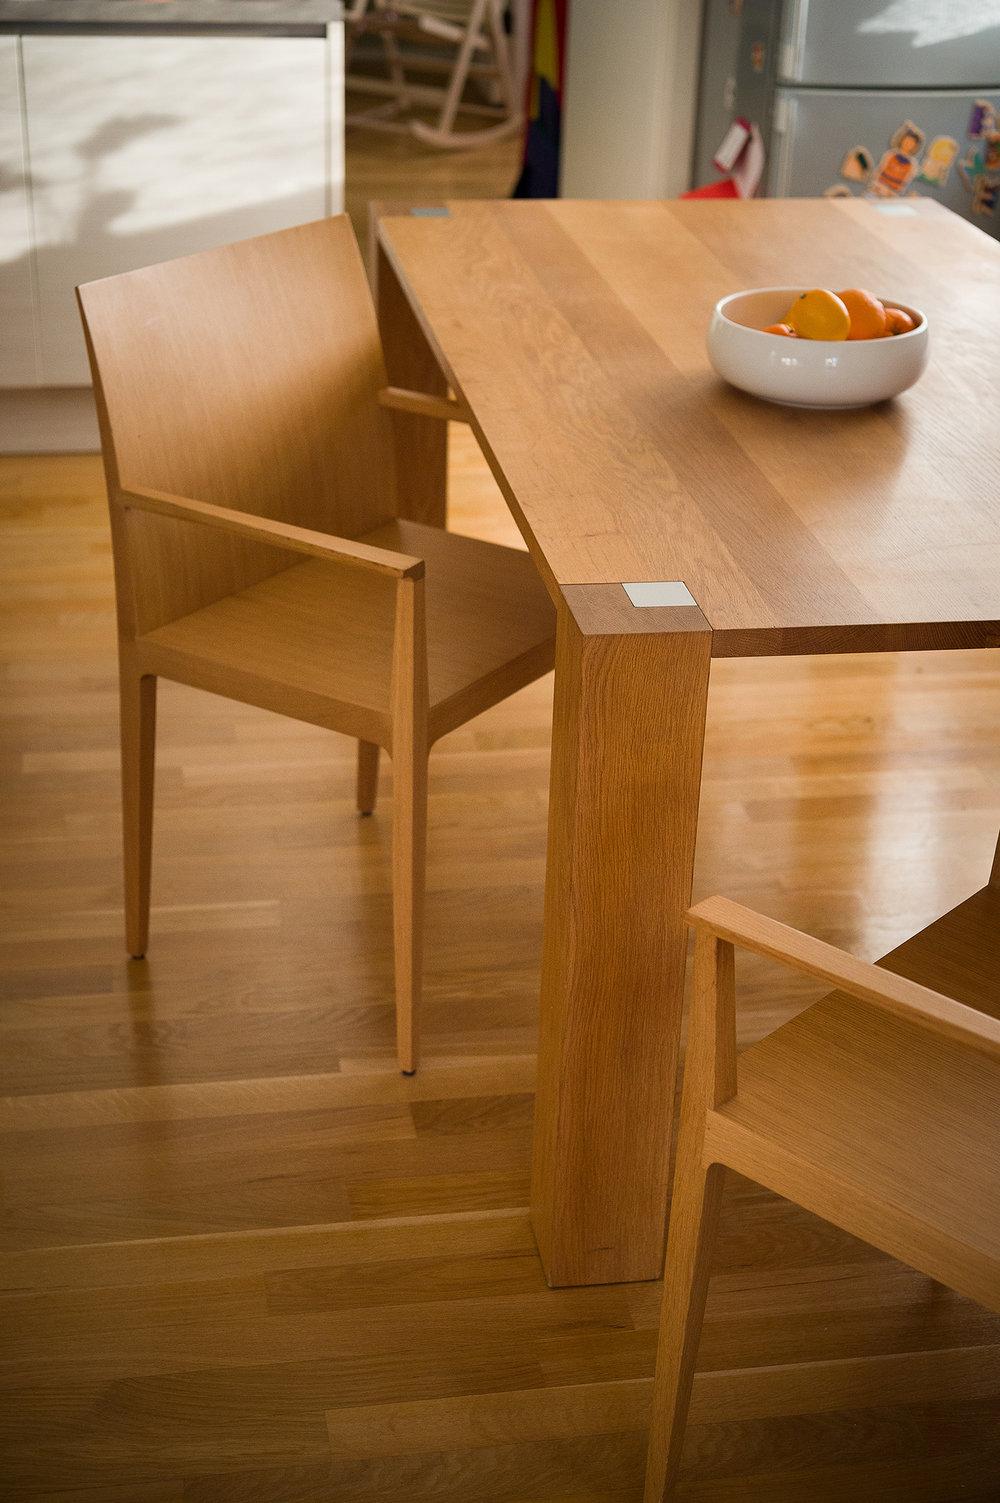 interior-Tina Rugelj_foto-Janez Marolt_AP F_jedilna miza-dining table_jedilni stol-dining chair_03.jpg